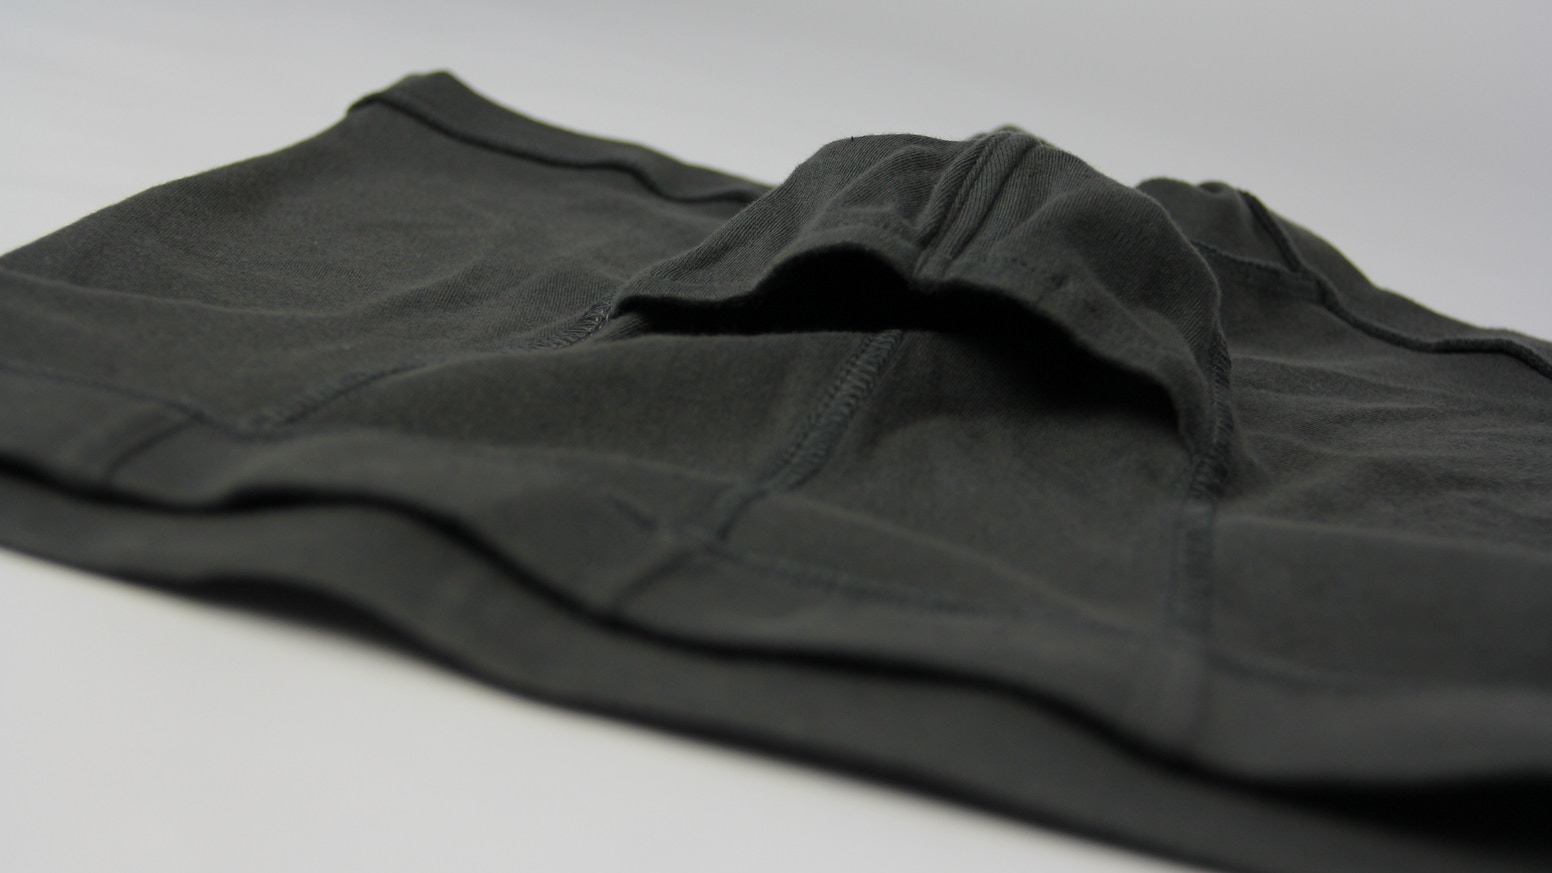 0d257463c5fb SHEATH UNDERWEAR: 100% Cotton Pouch Comfort Boxer Briefs by Robert ...